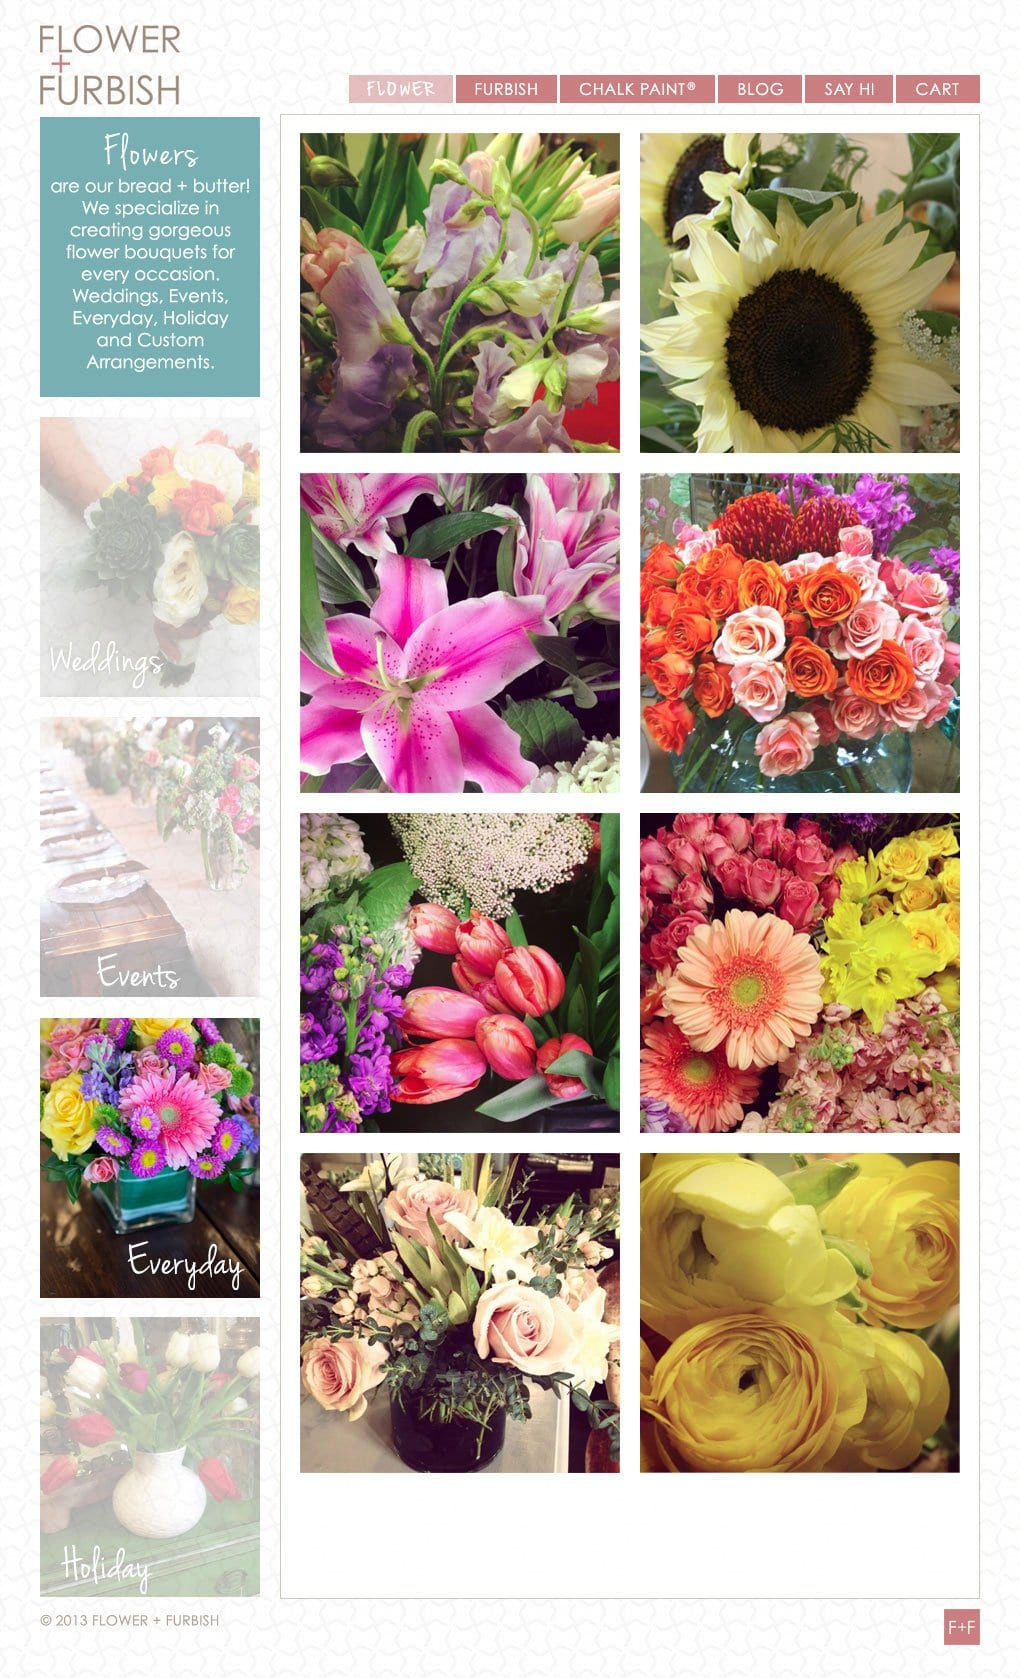 Flower + Furbish